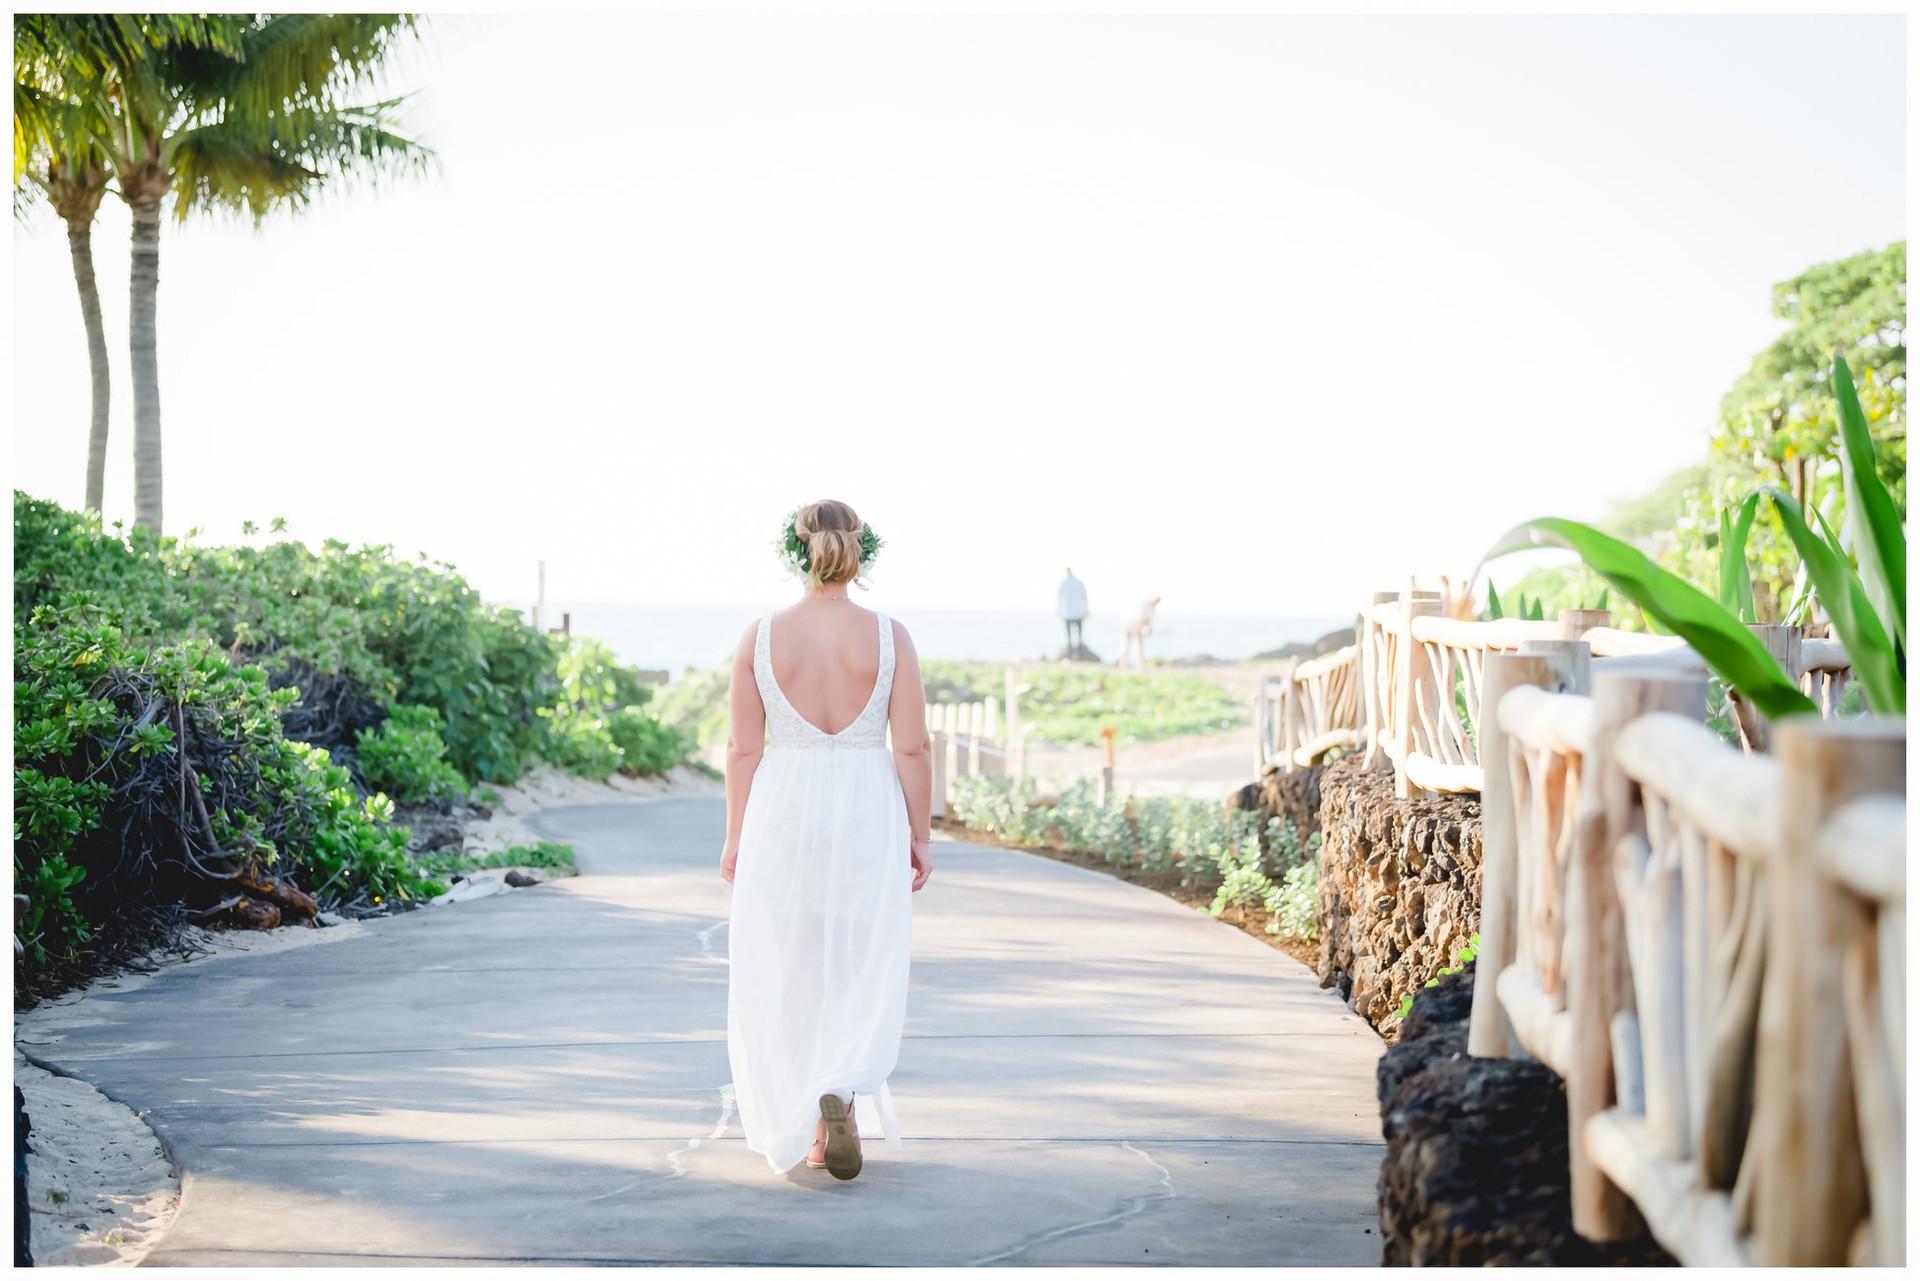 Hawaii Beach Weddings-2.jpg